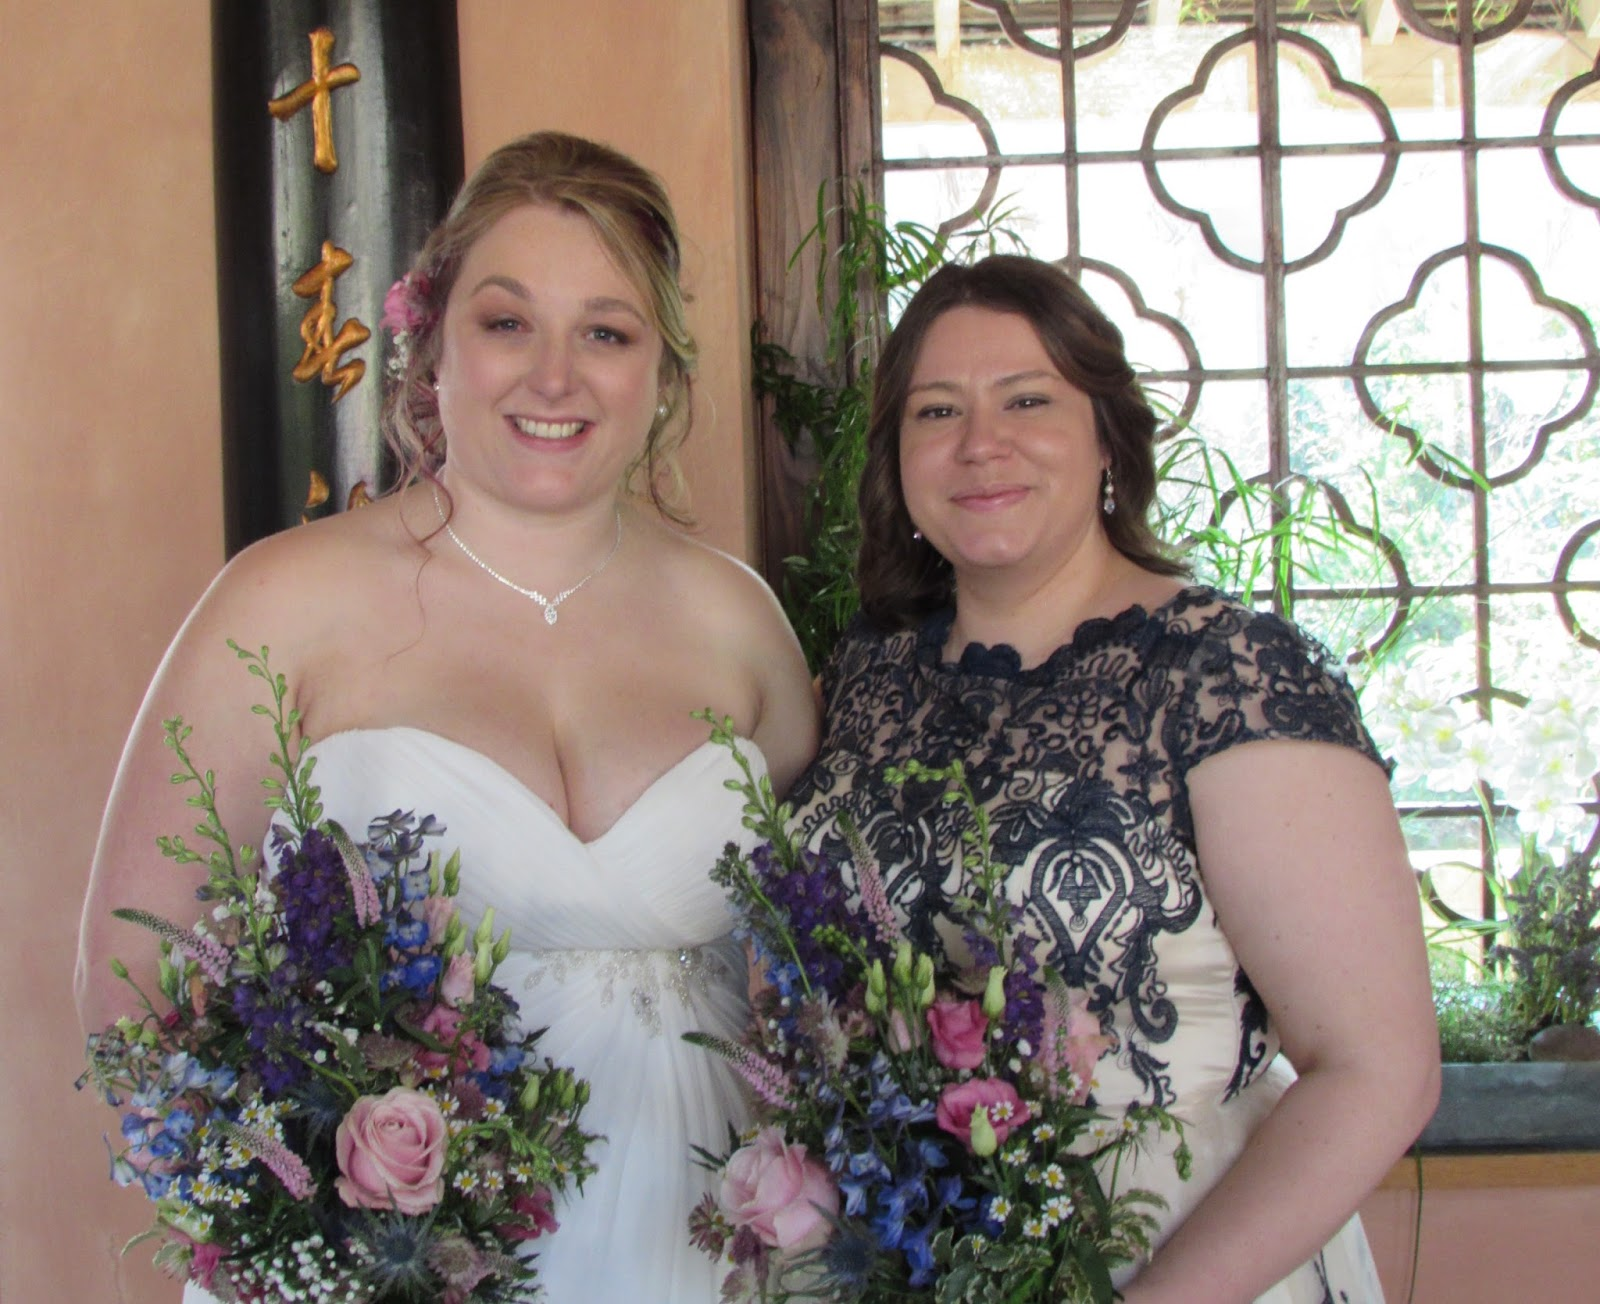 Me & the beautiful bride